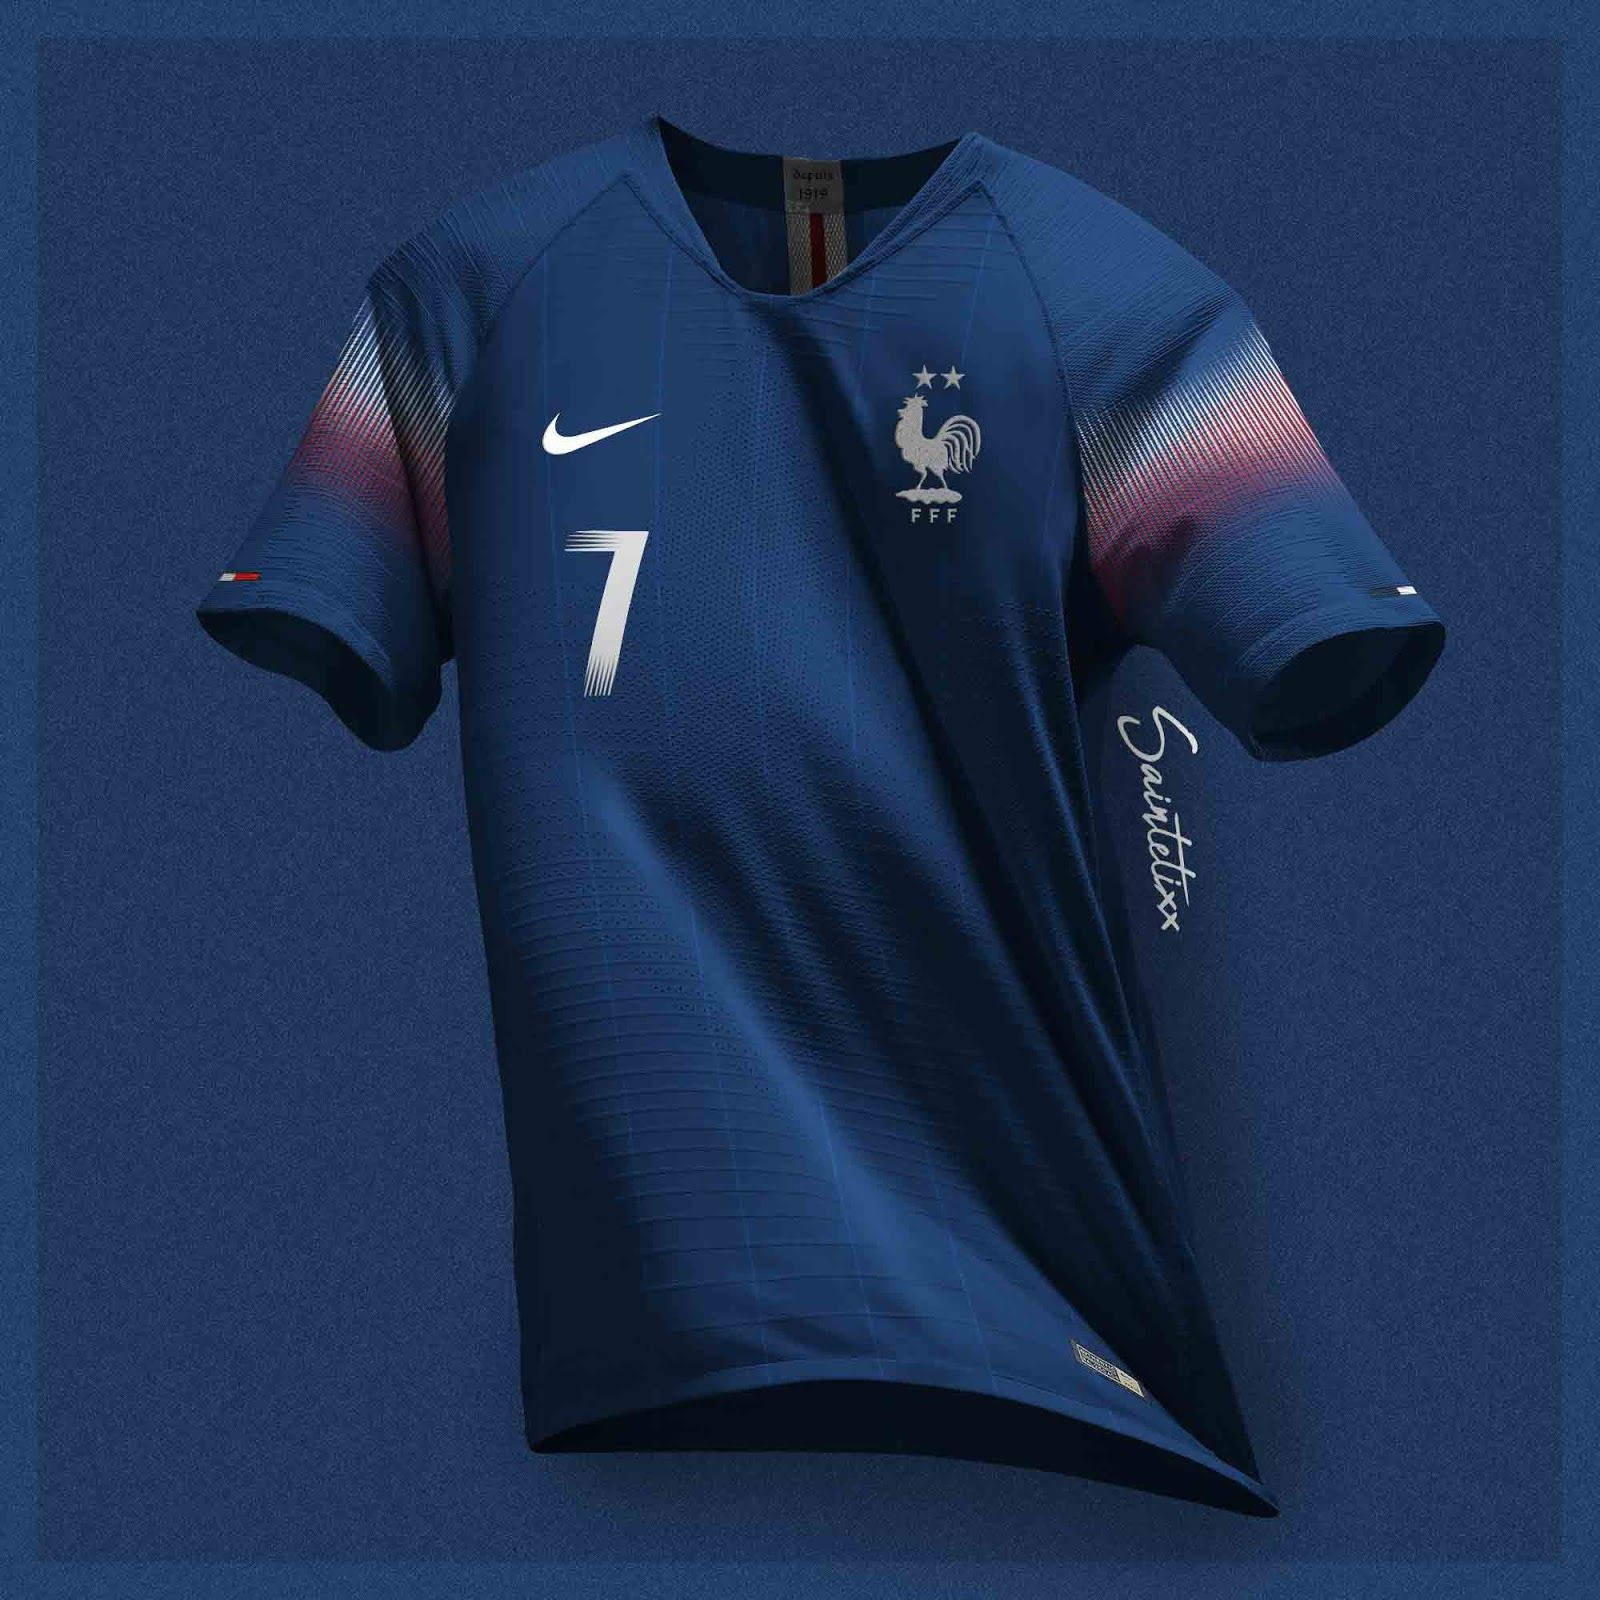 France 2020 22 Concept Kits By Saintetixx Footy Headlines Sports Jersey Design Soccer Uniforms Design Sports Shirts